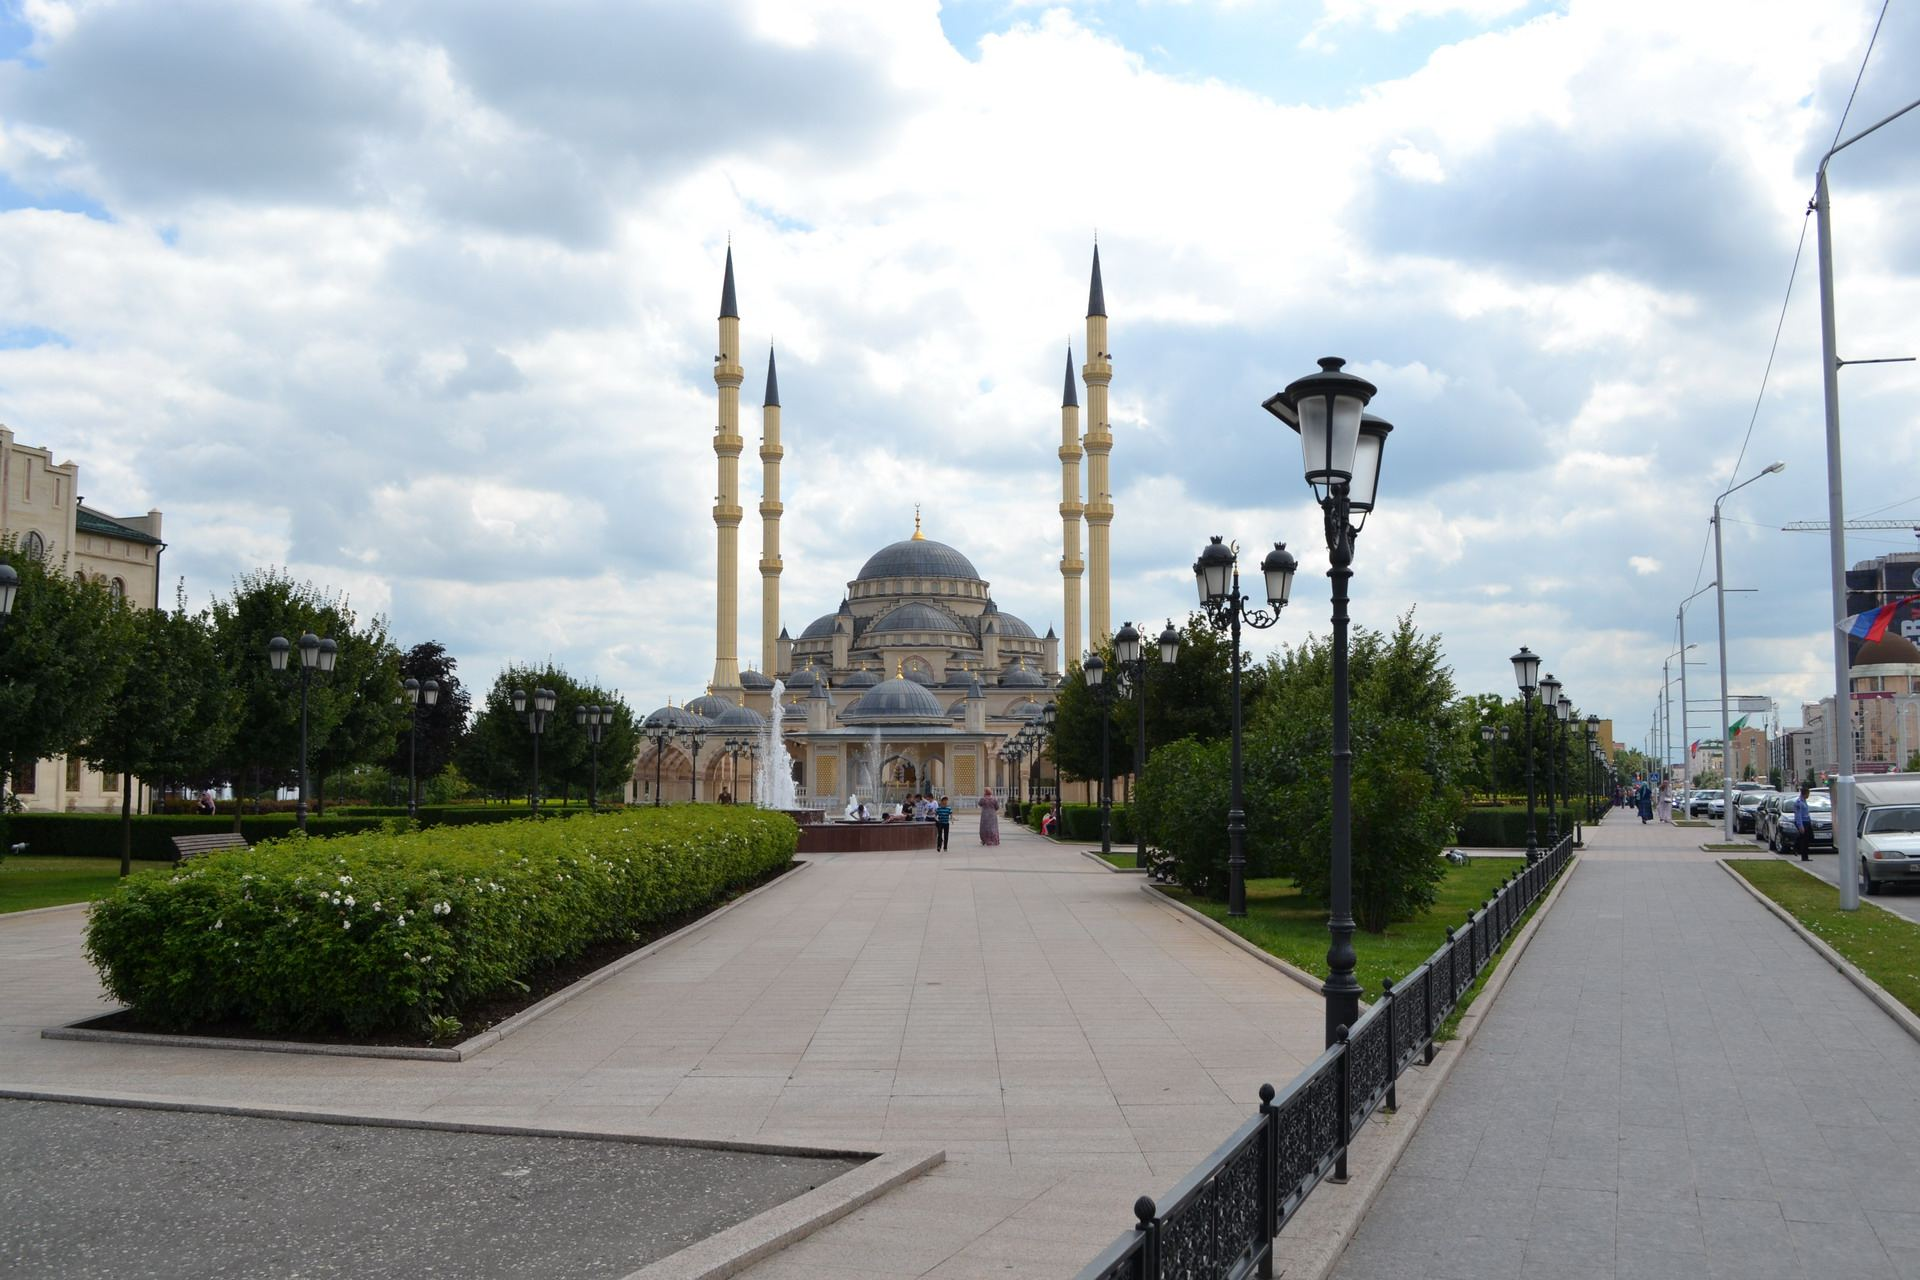 сердце чечни, мечеть